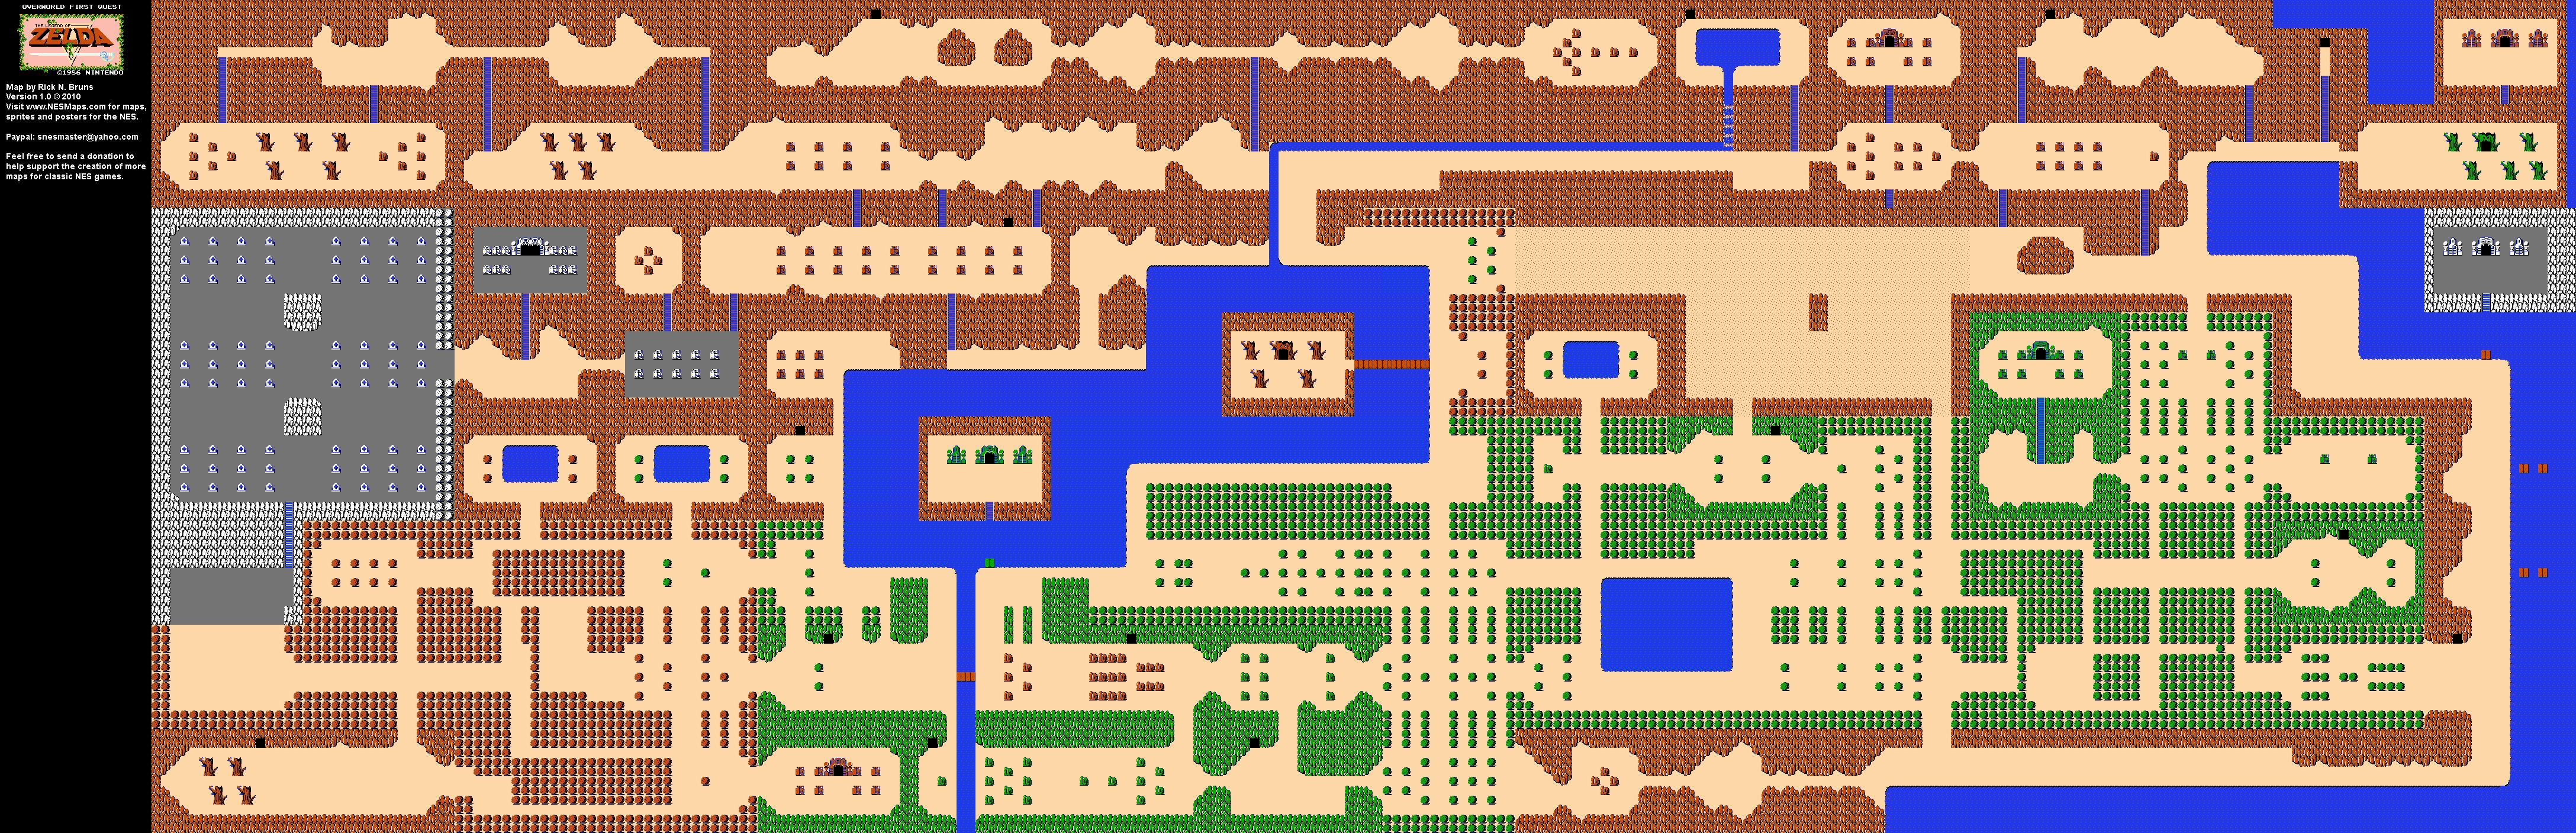 The Legend of Zelda - Overworld Quest 1 Map BG